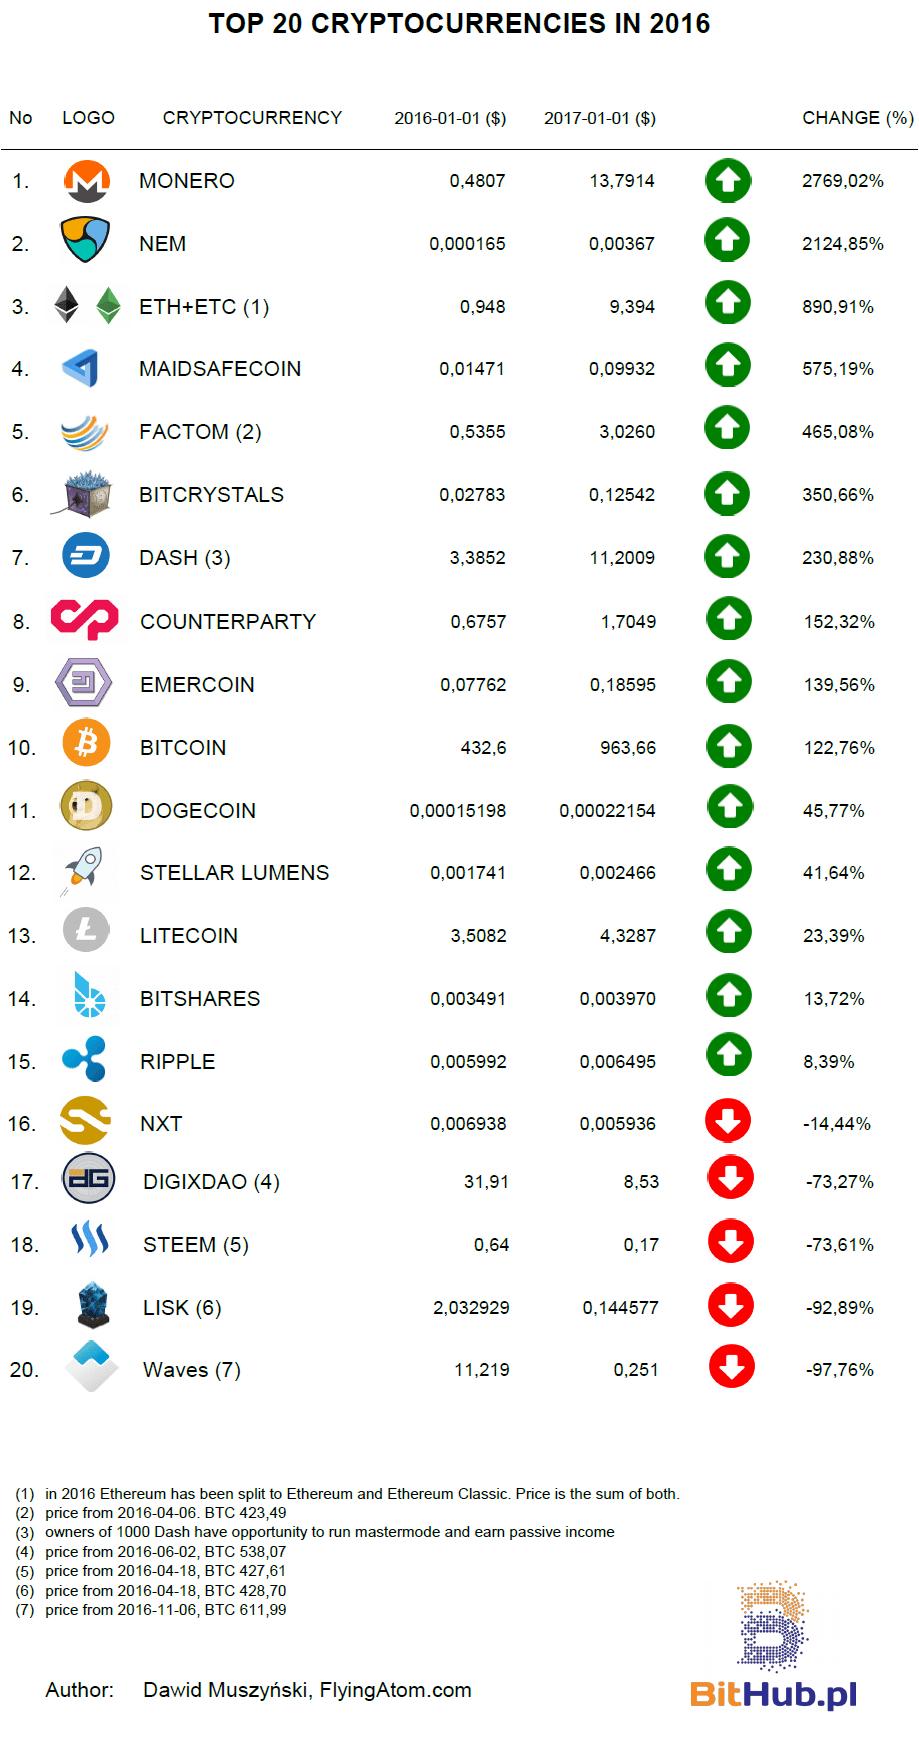 List of dag cryptocurrencies